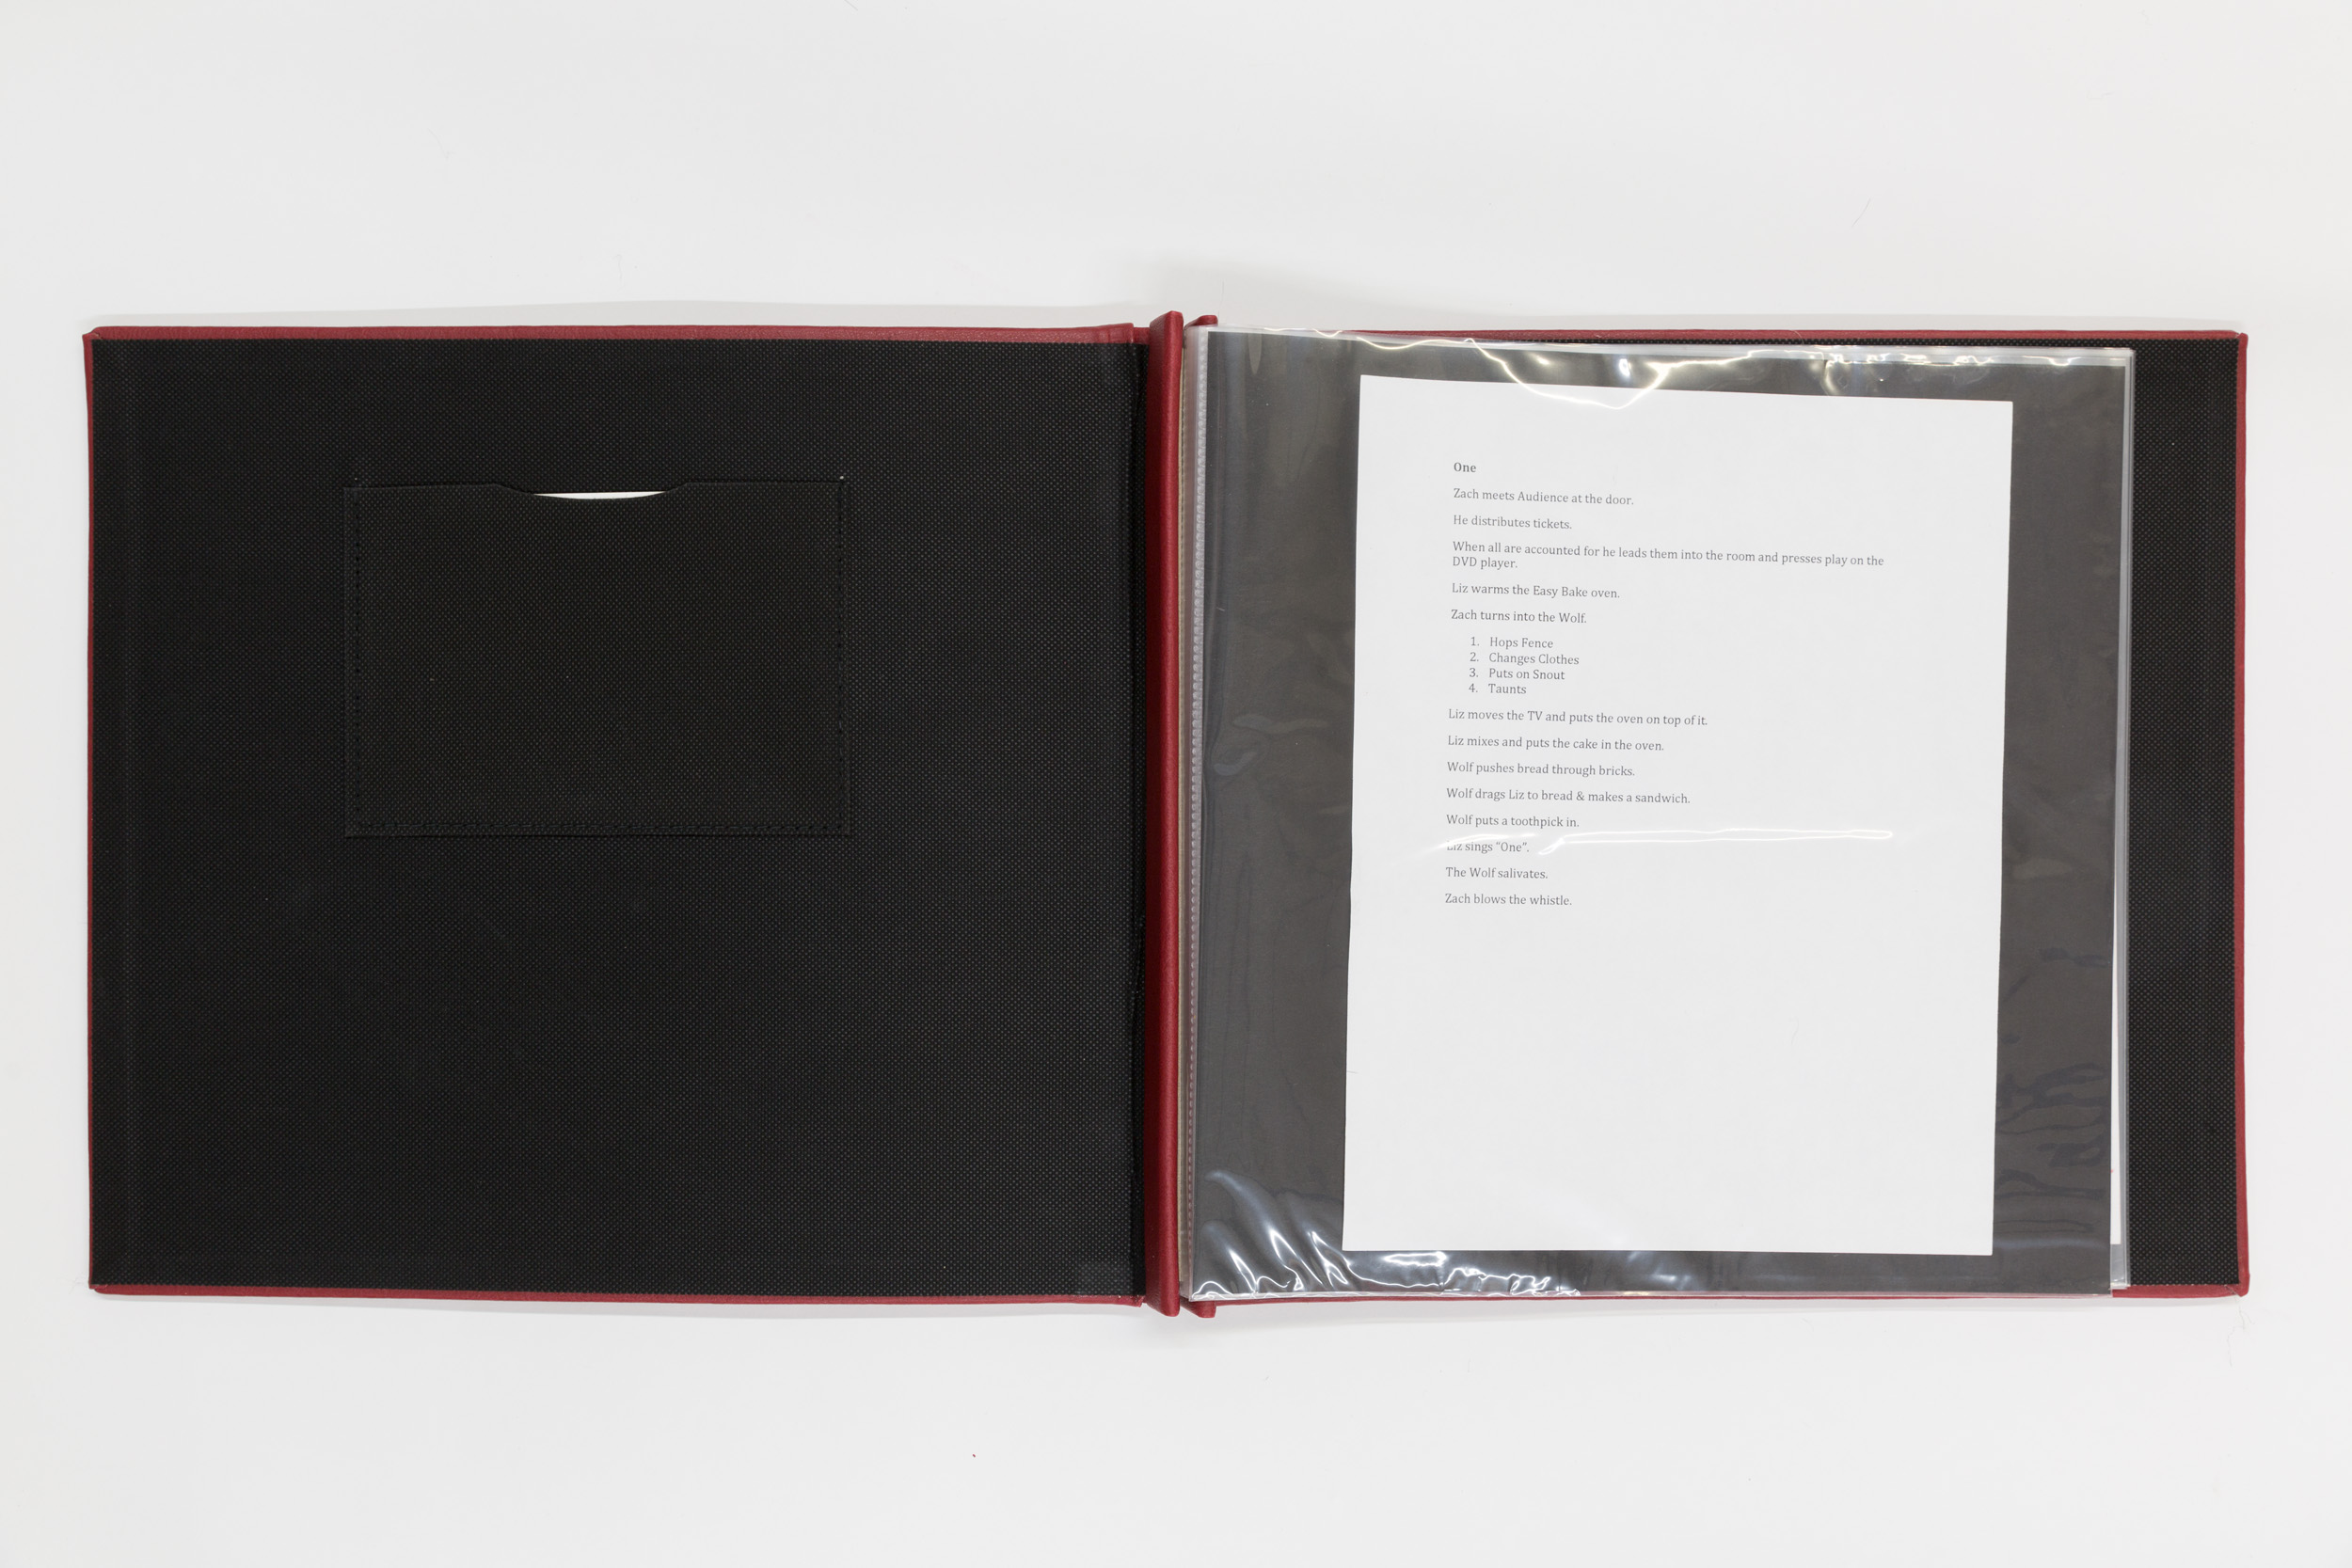 VGH_Book1_FirstPage.jpg